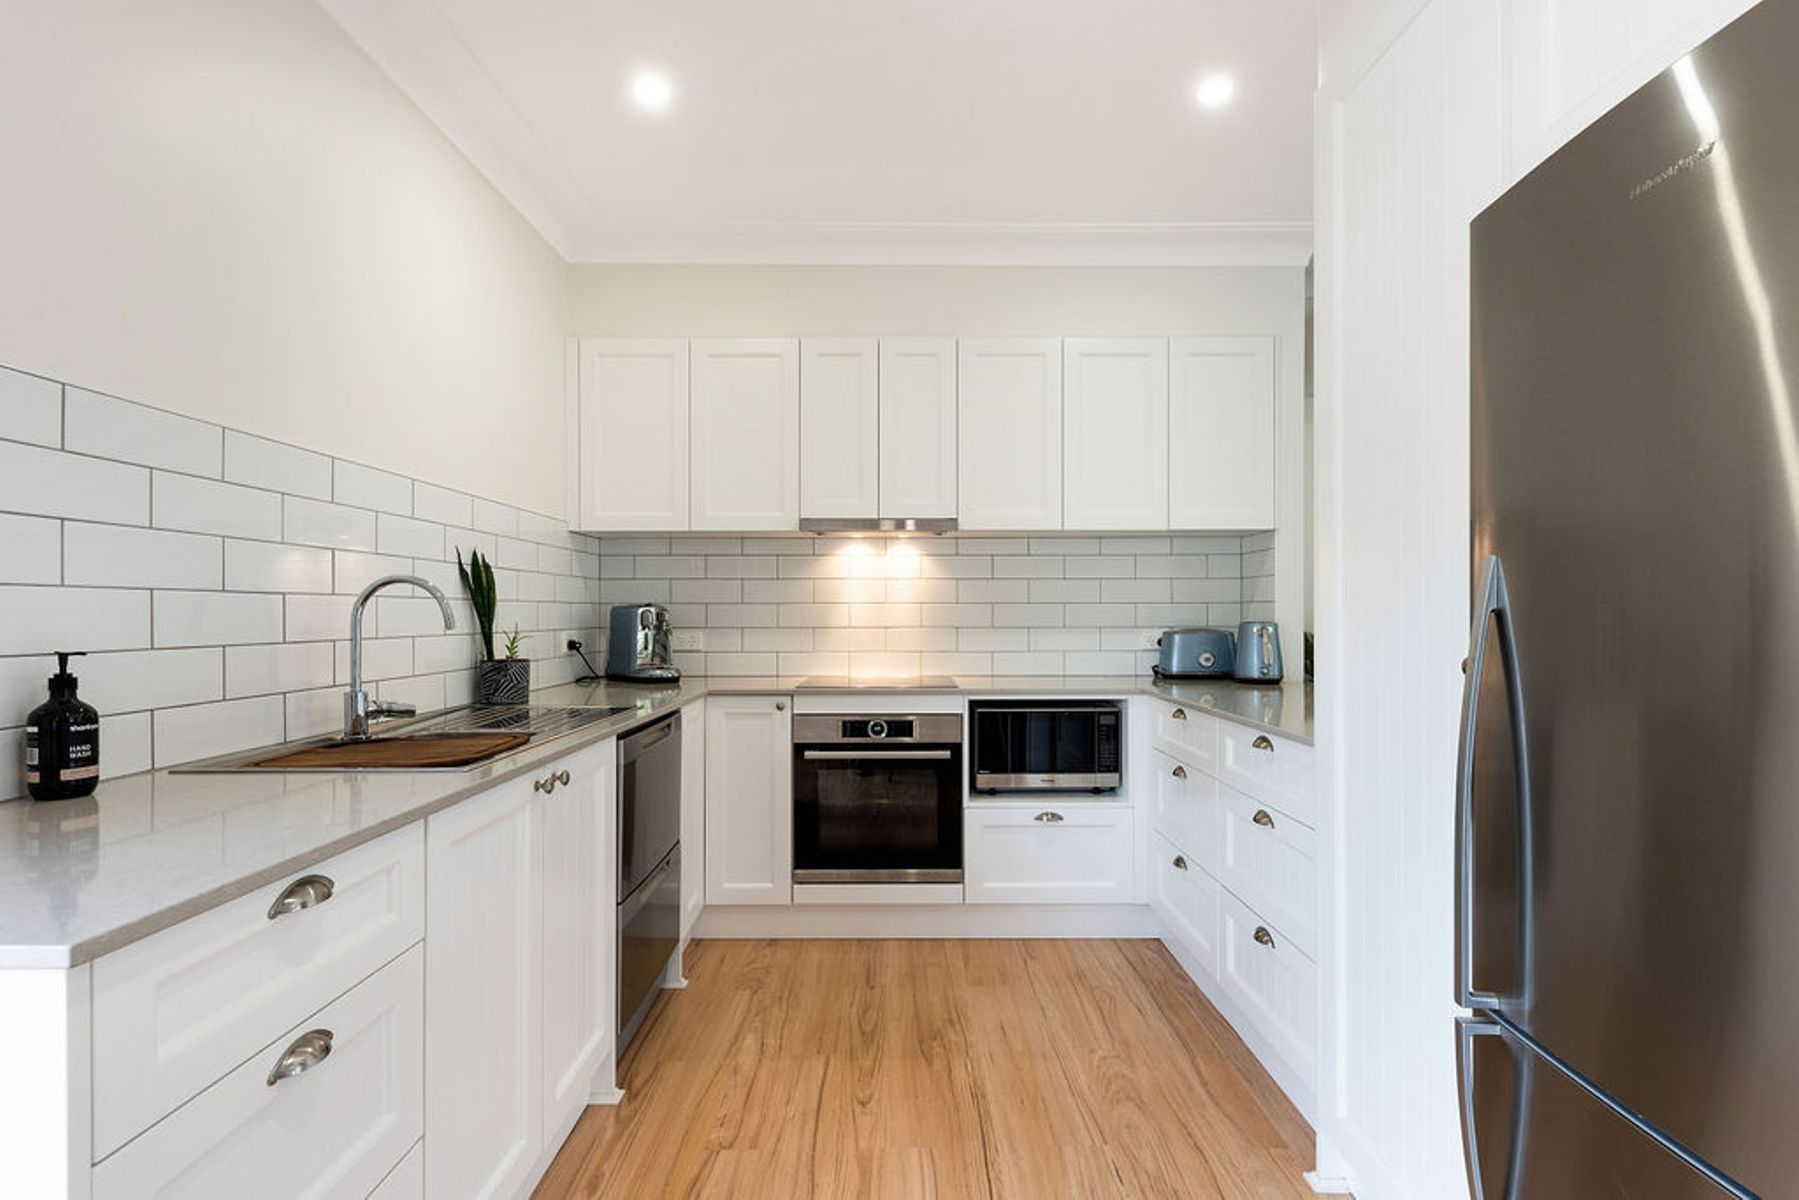 14 Valiant Ave, Valentine NSW 2280, Australia , House for